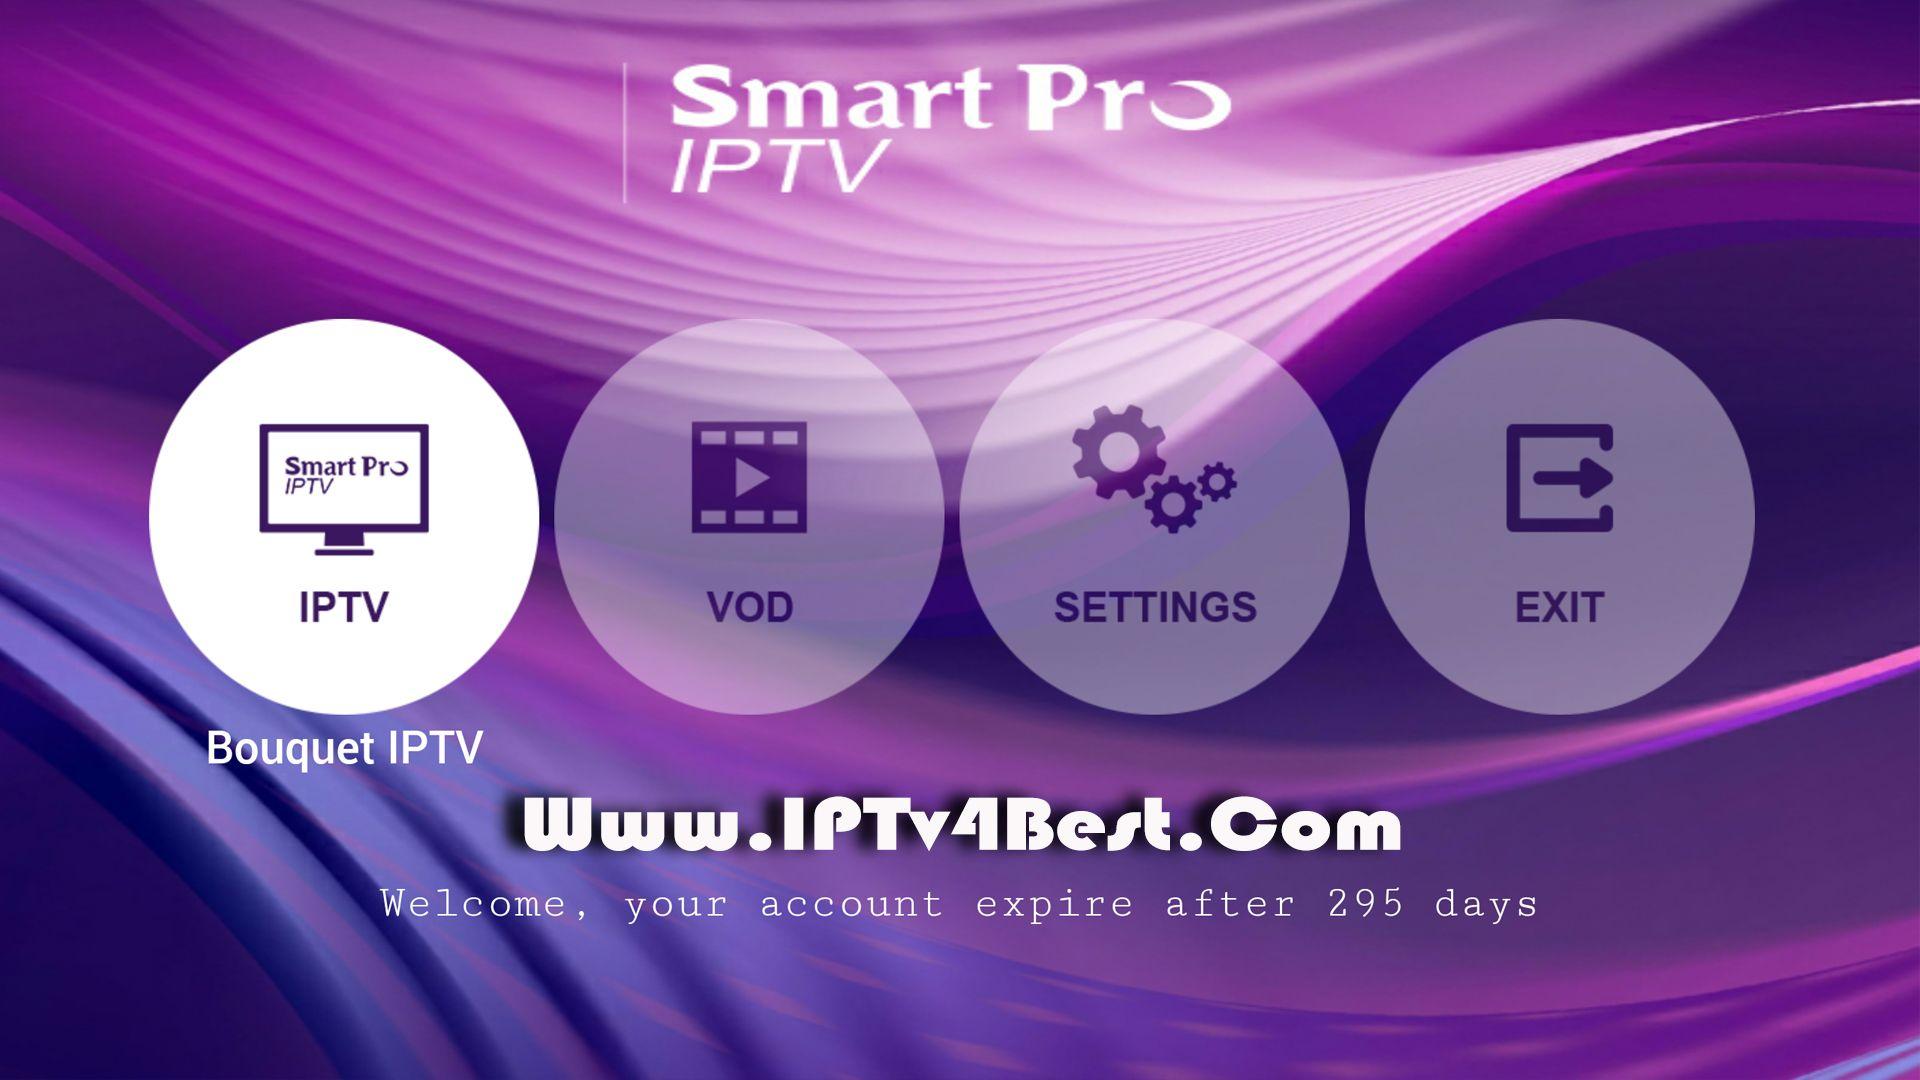 Smartpro Tv Apk Activation Code 1 Year Free In 2021 Tv Coding Smart Tv